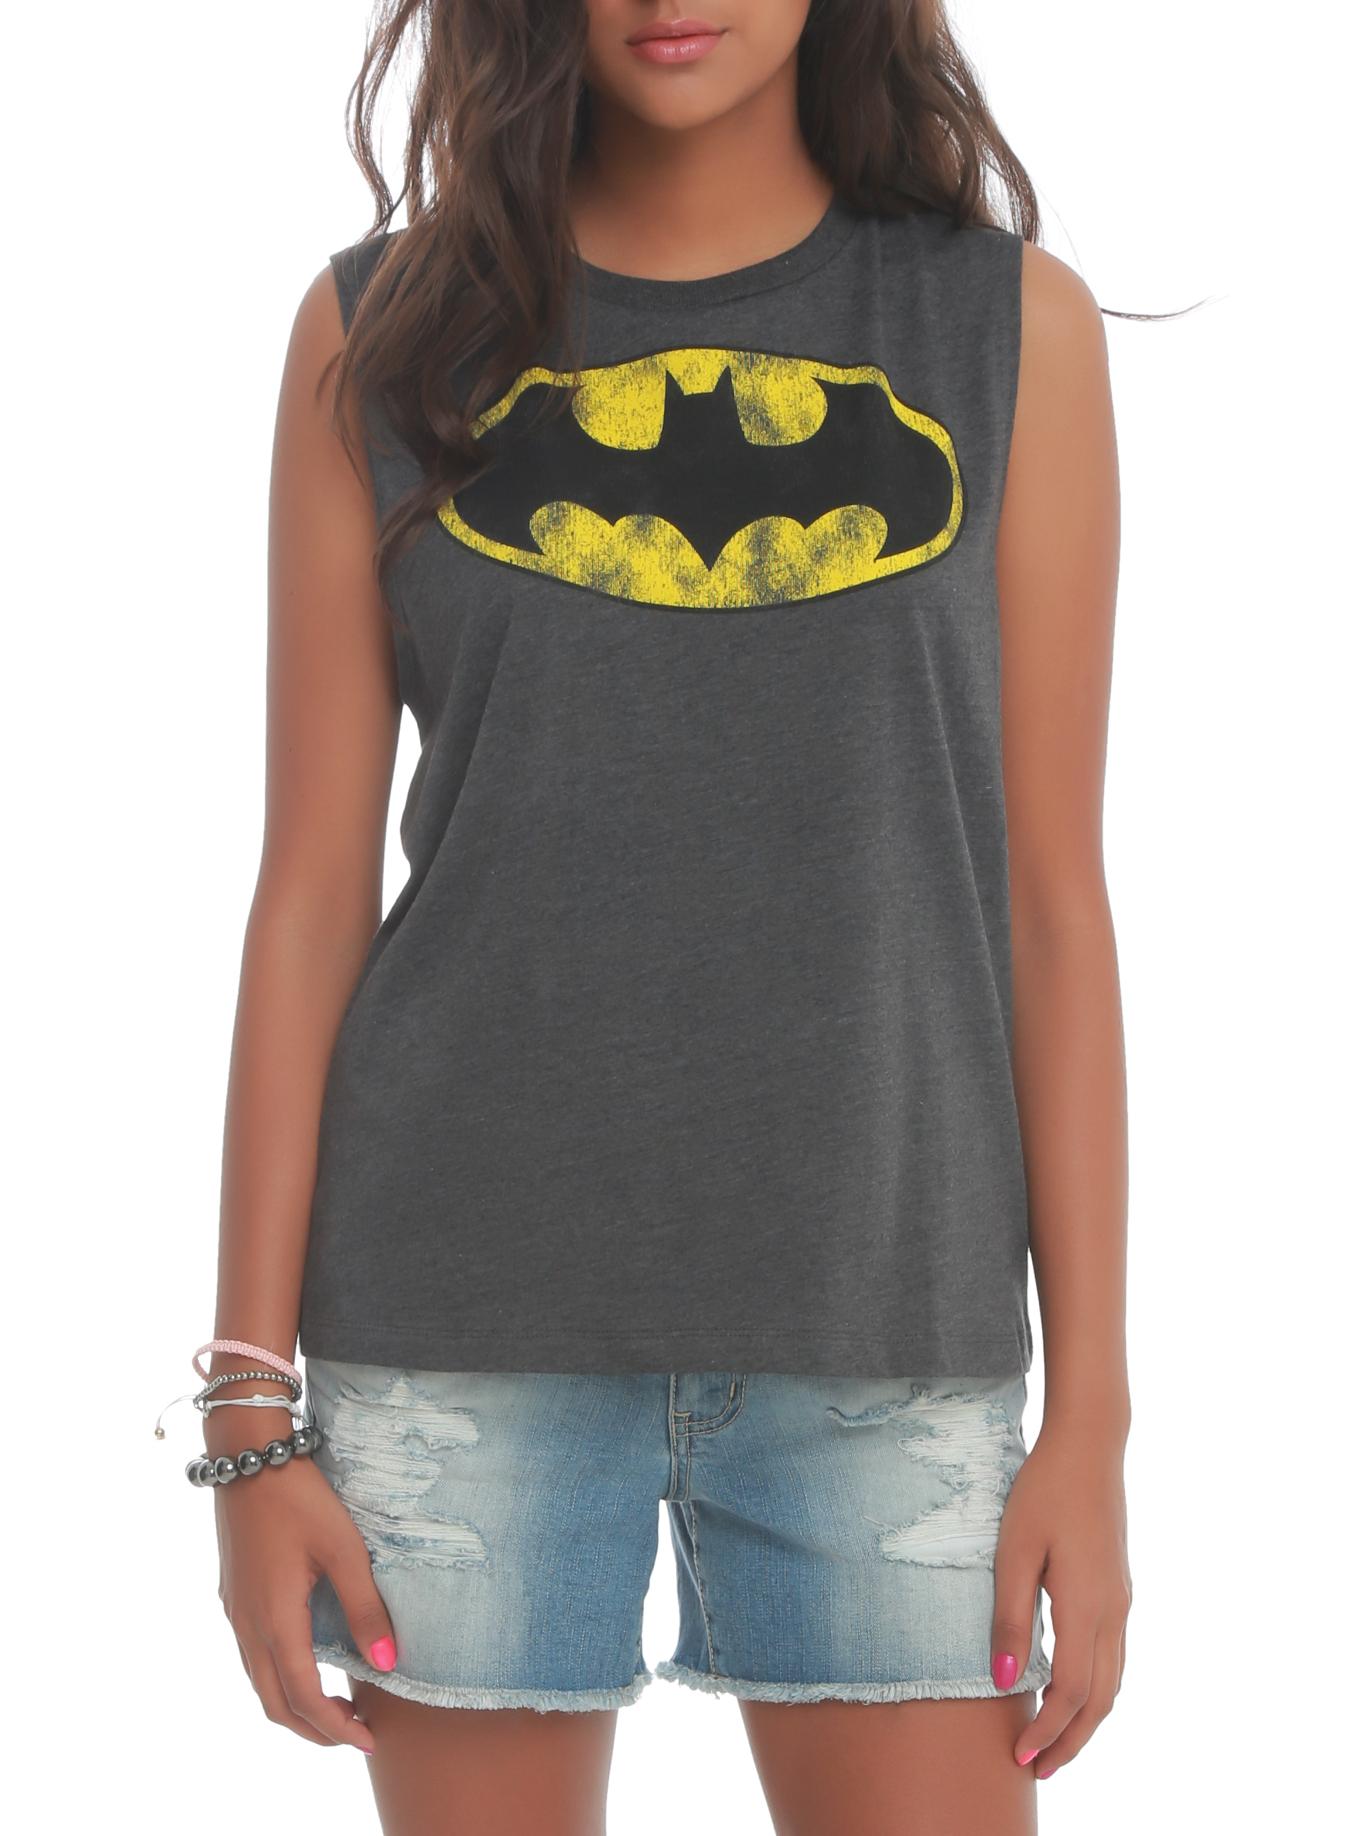 DC Comics Batman Striped Muscle Girls Top | Hot Topic